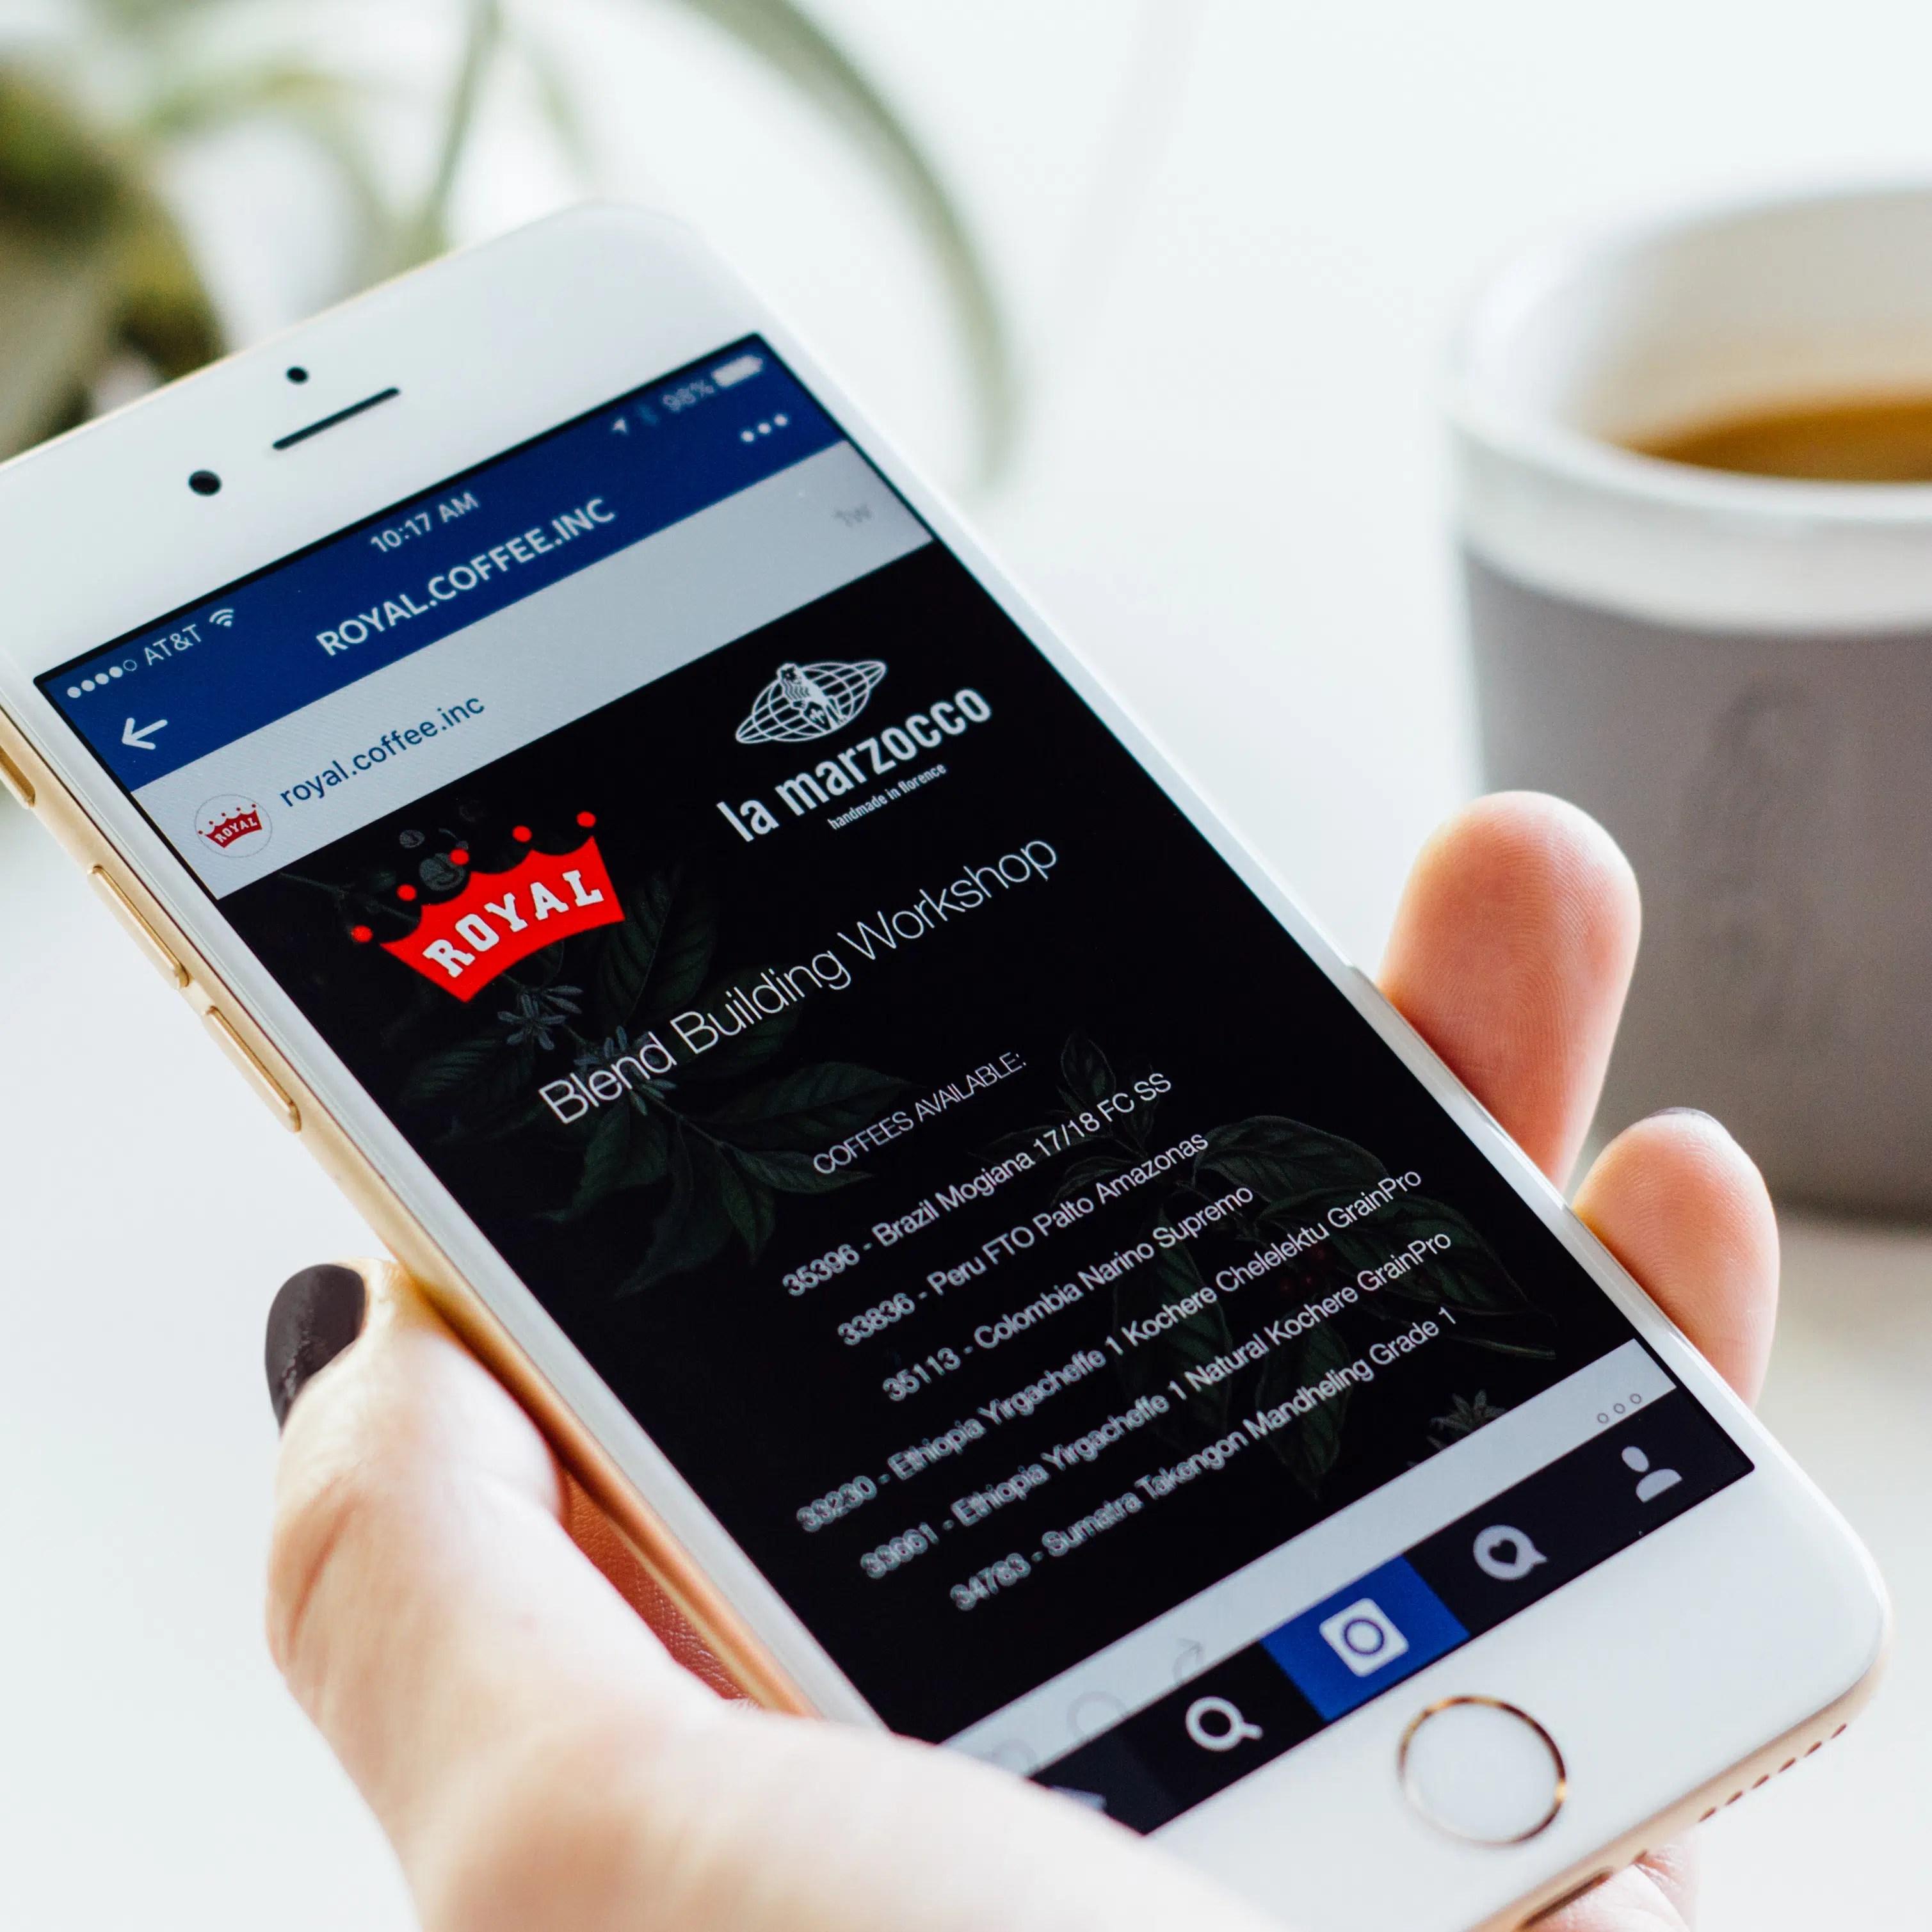 Royal Coffee website on iPhone